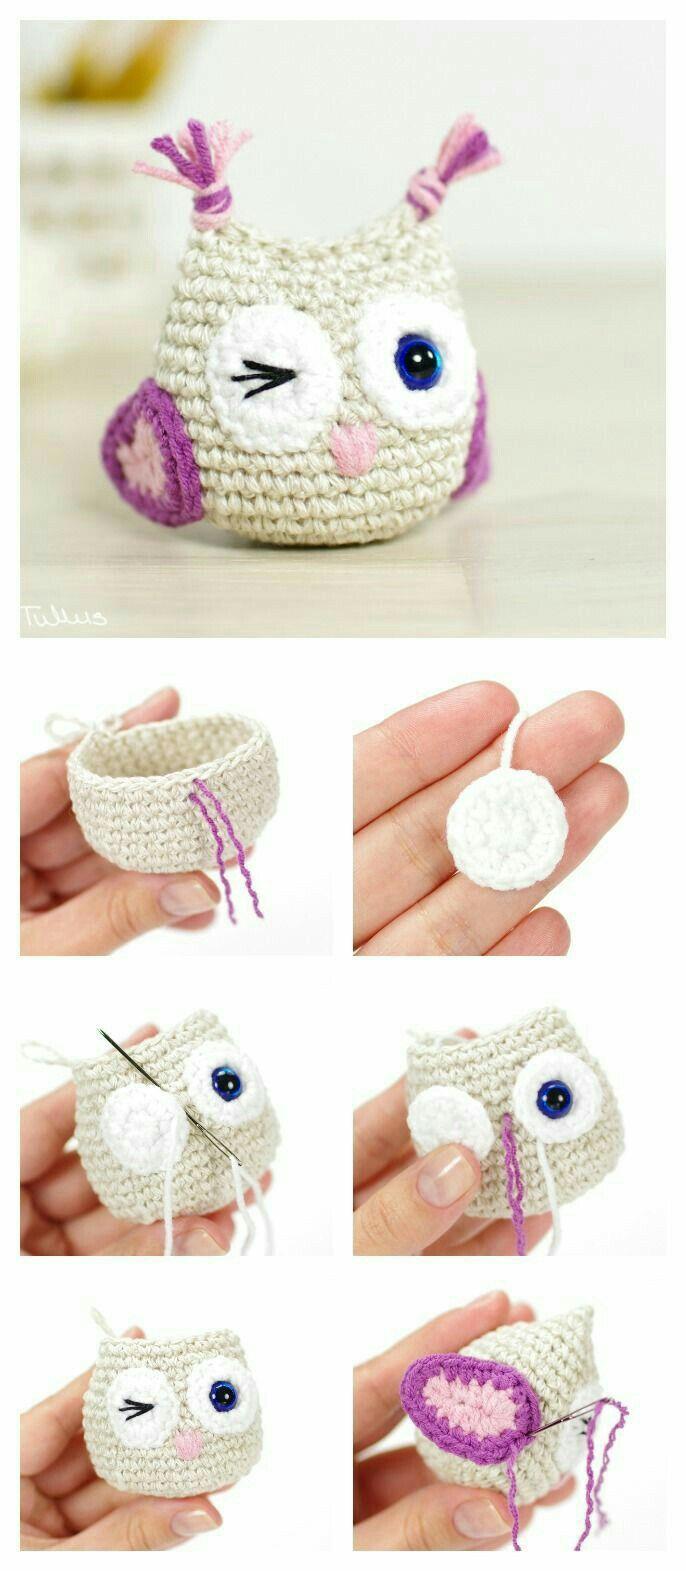 Pin de Trina Unsworth en Crocheting and Knitting | Pinterest ...